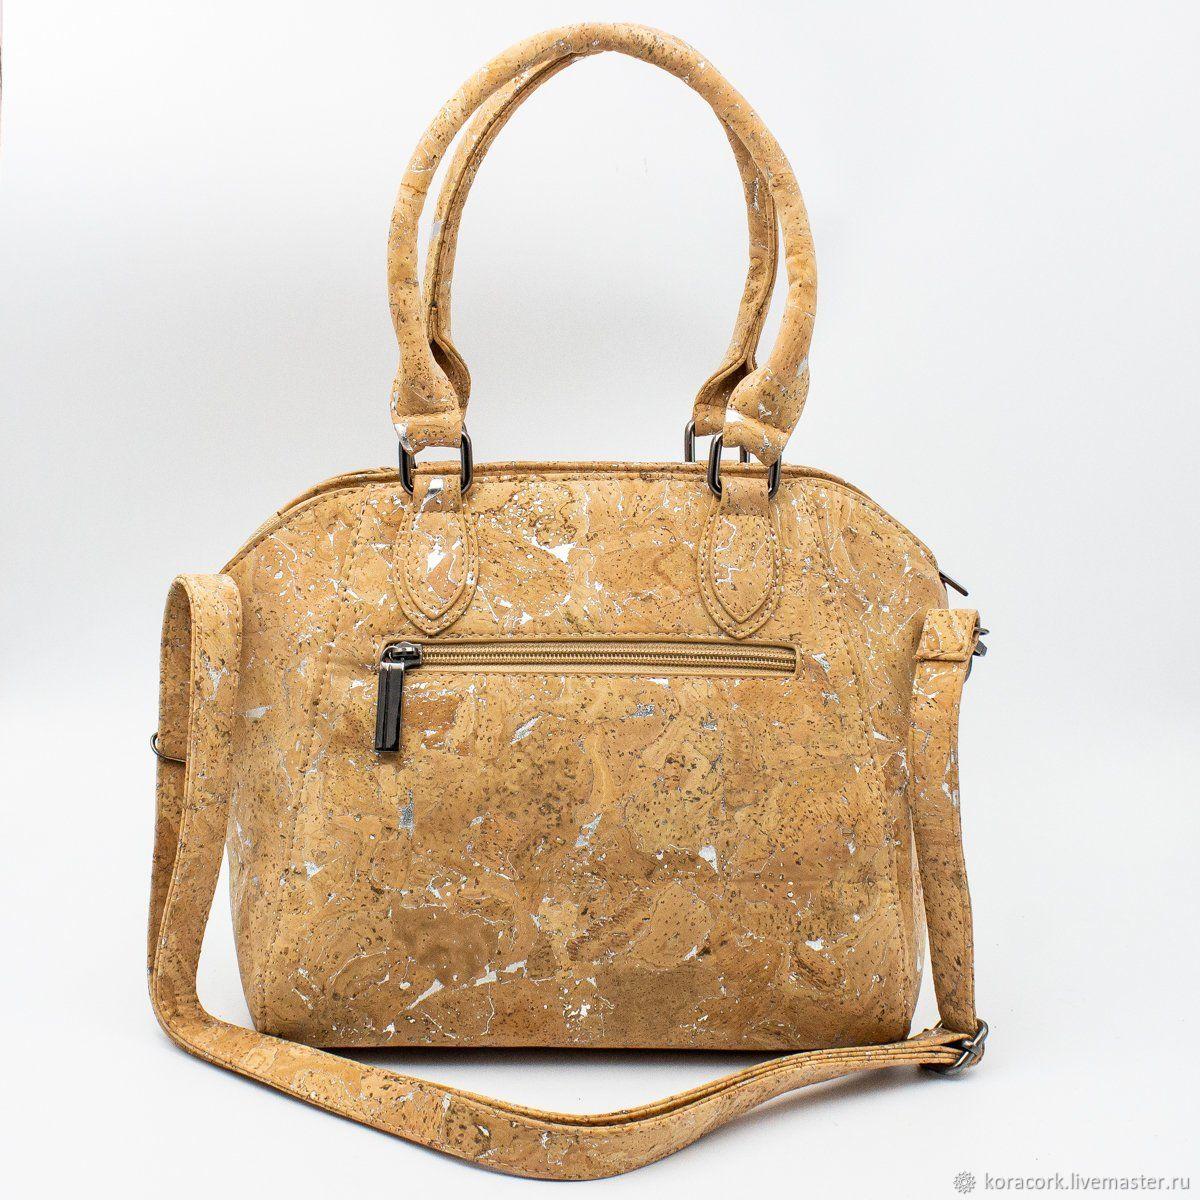 Bags & Accessories handmade. Livemaster - handmade. Buy Eco bag natural women's cork handmade.